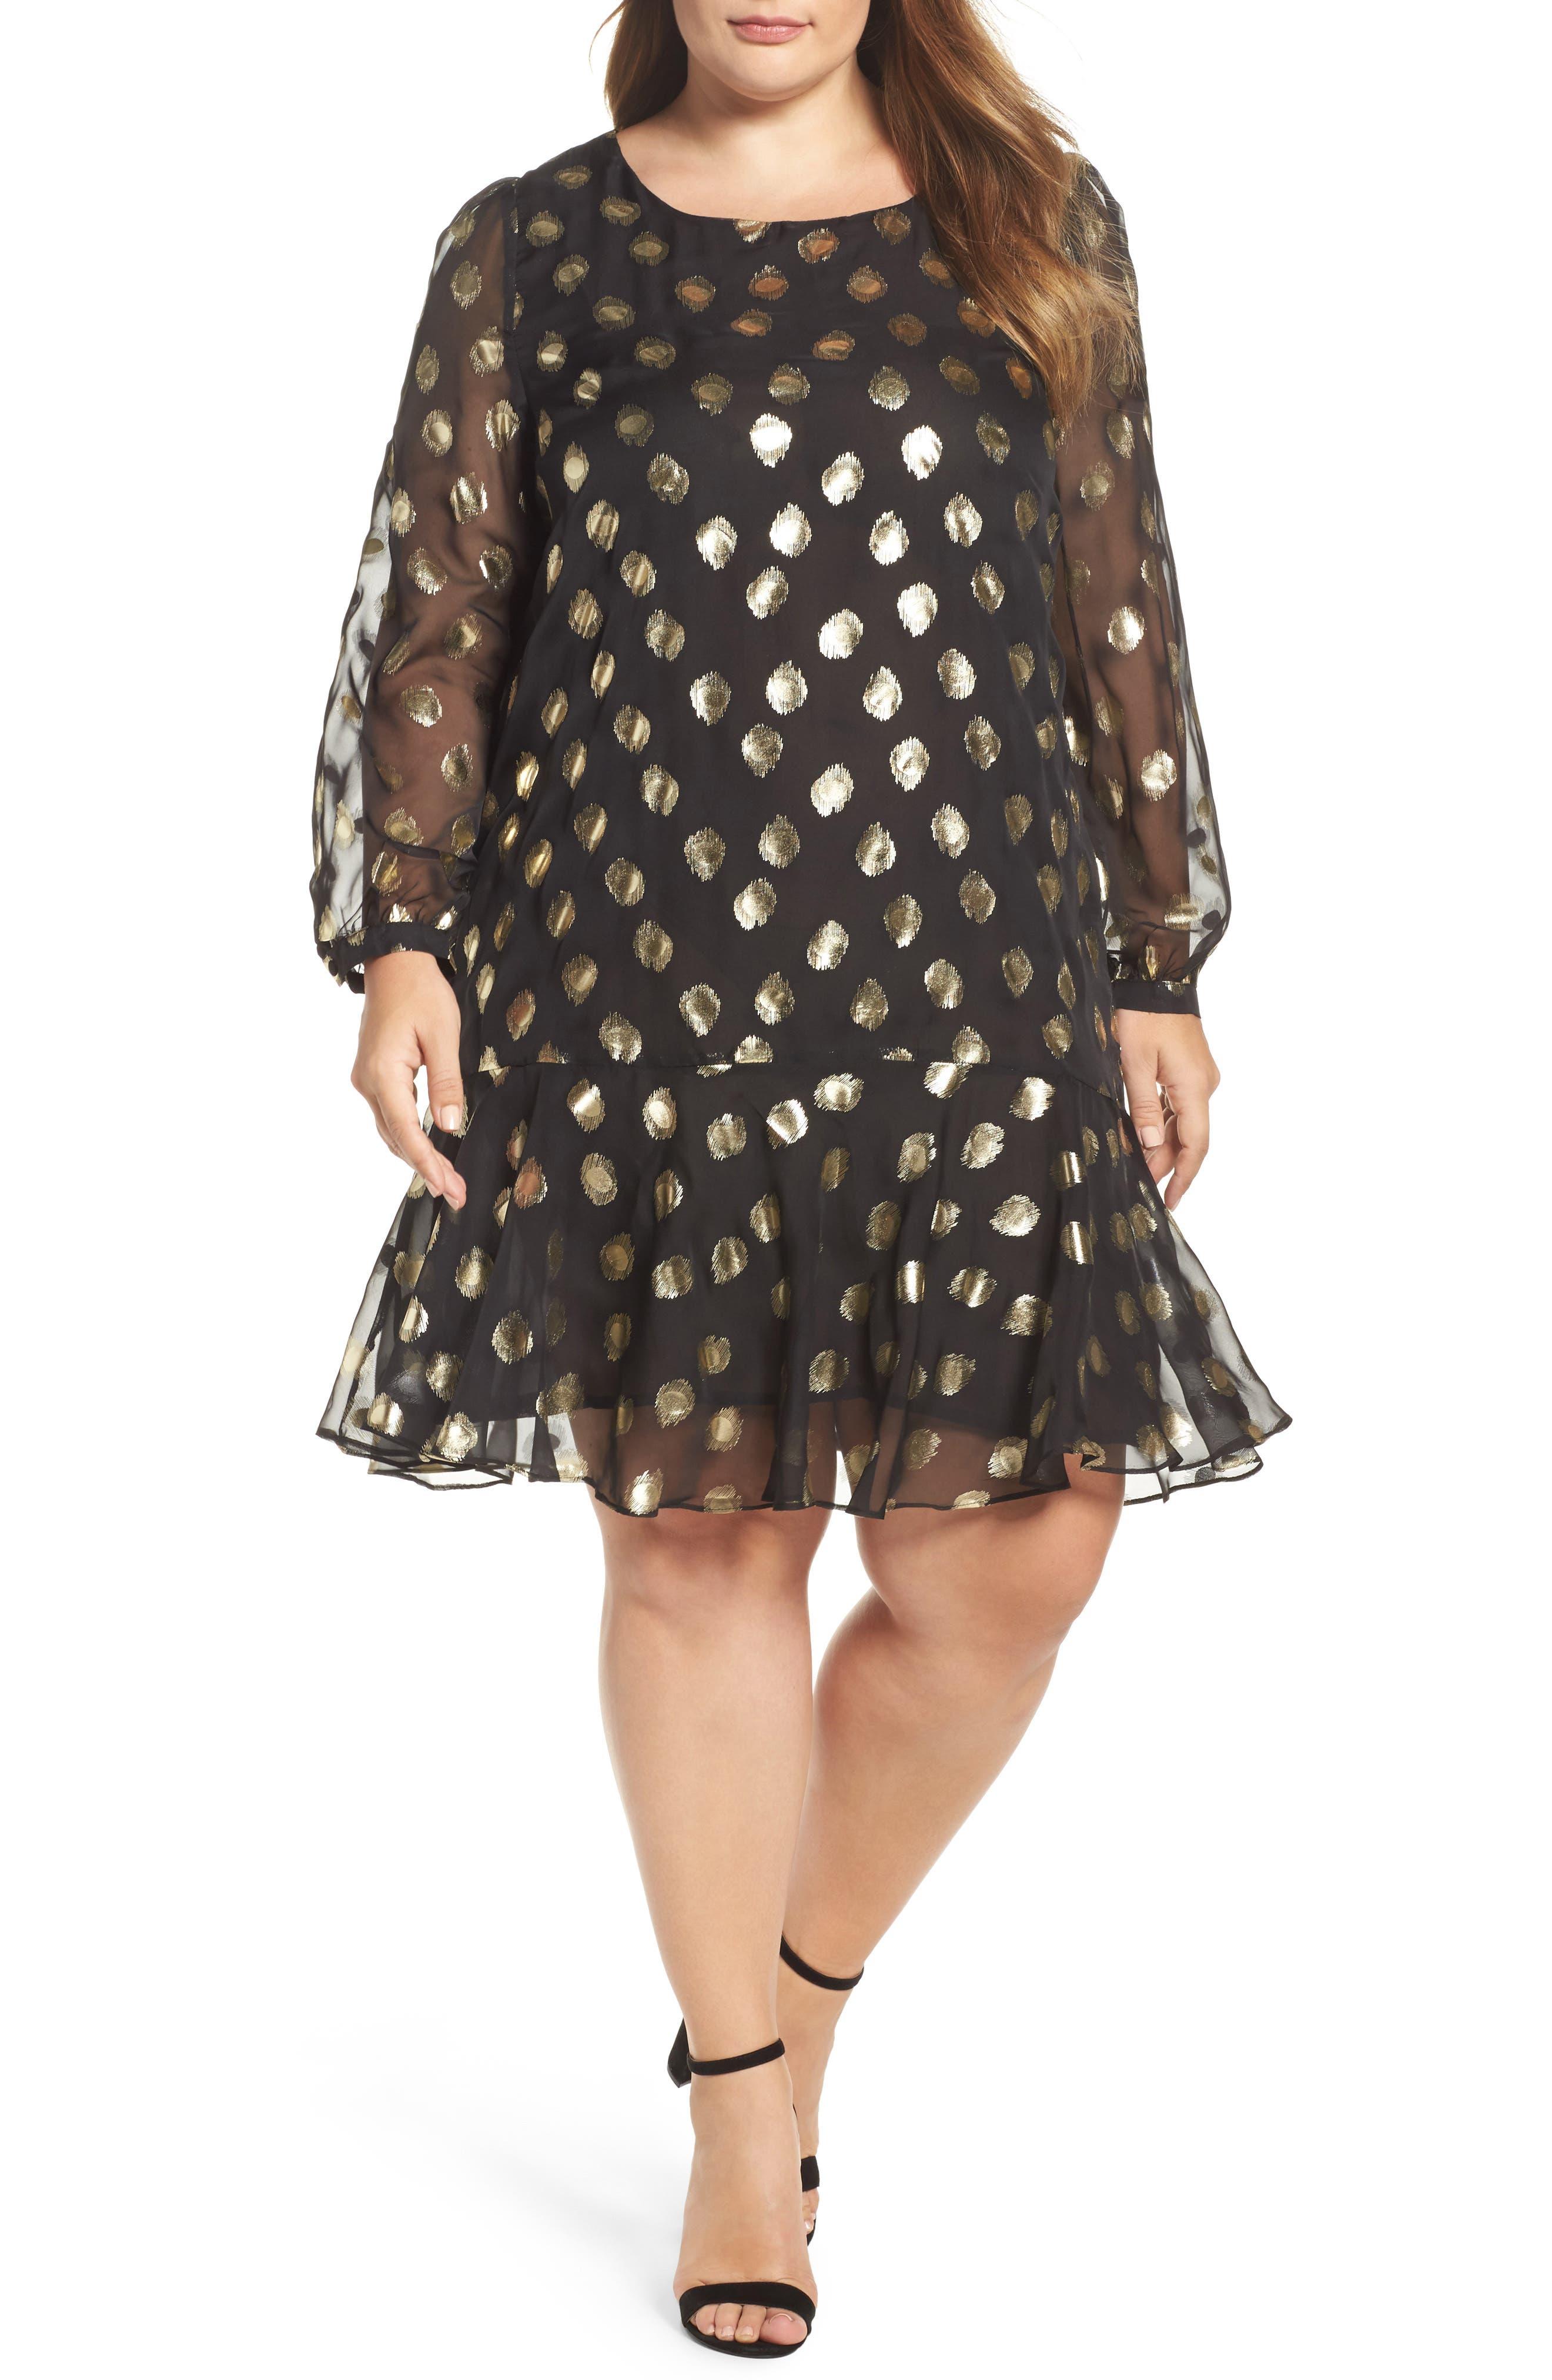 Alternate Image 1 Selected - Glamorous Metallic Dot Drop Waist Dress (Plus Size)